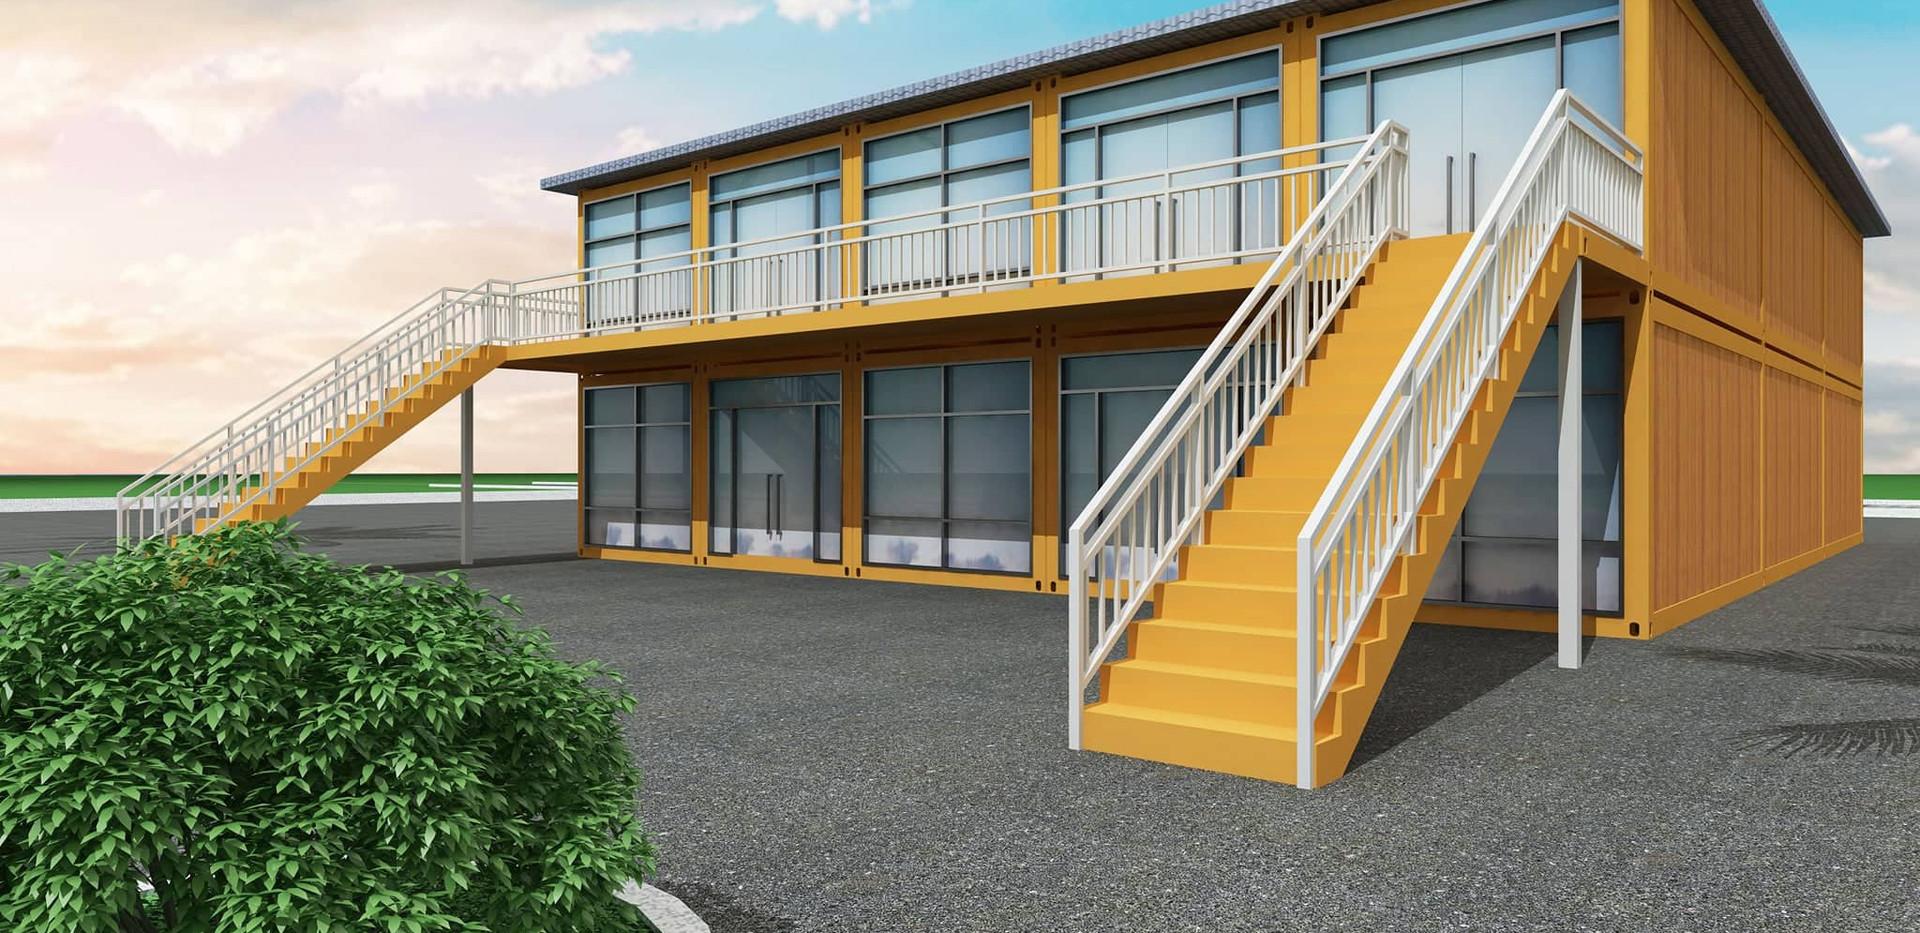 FRP Building